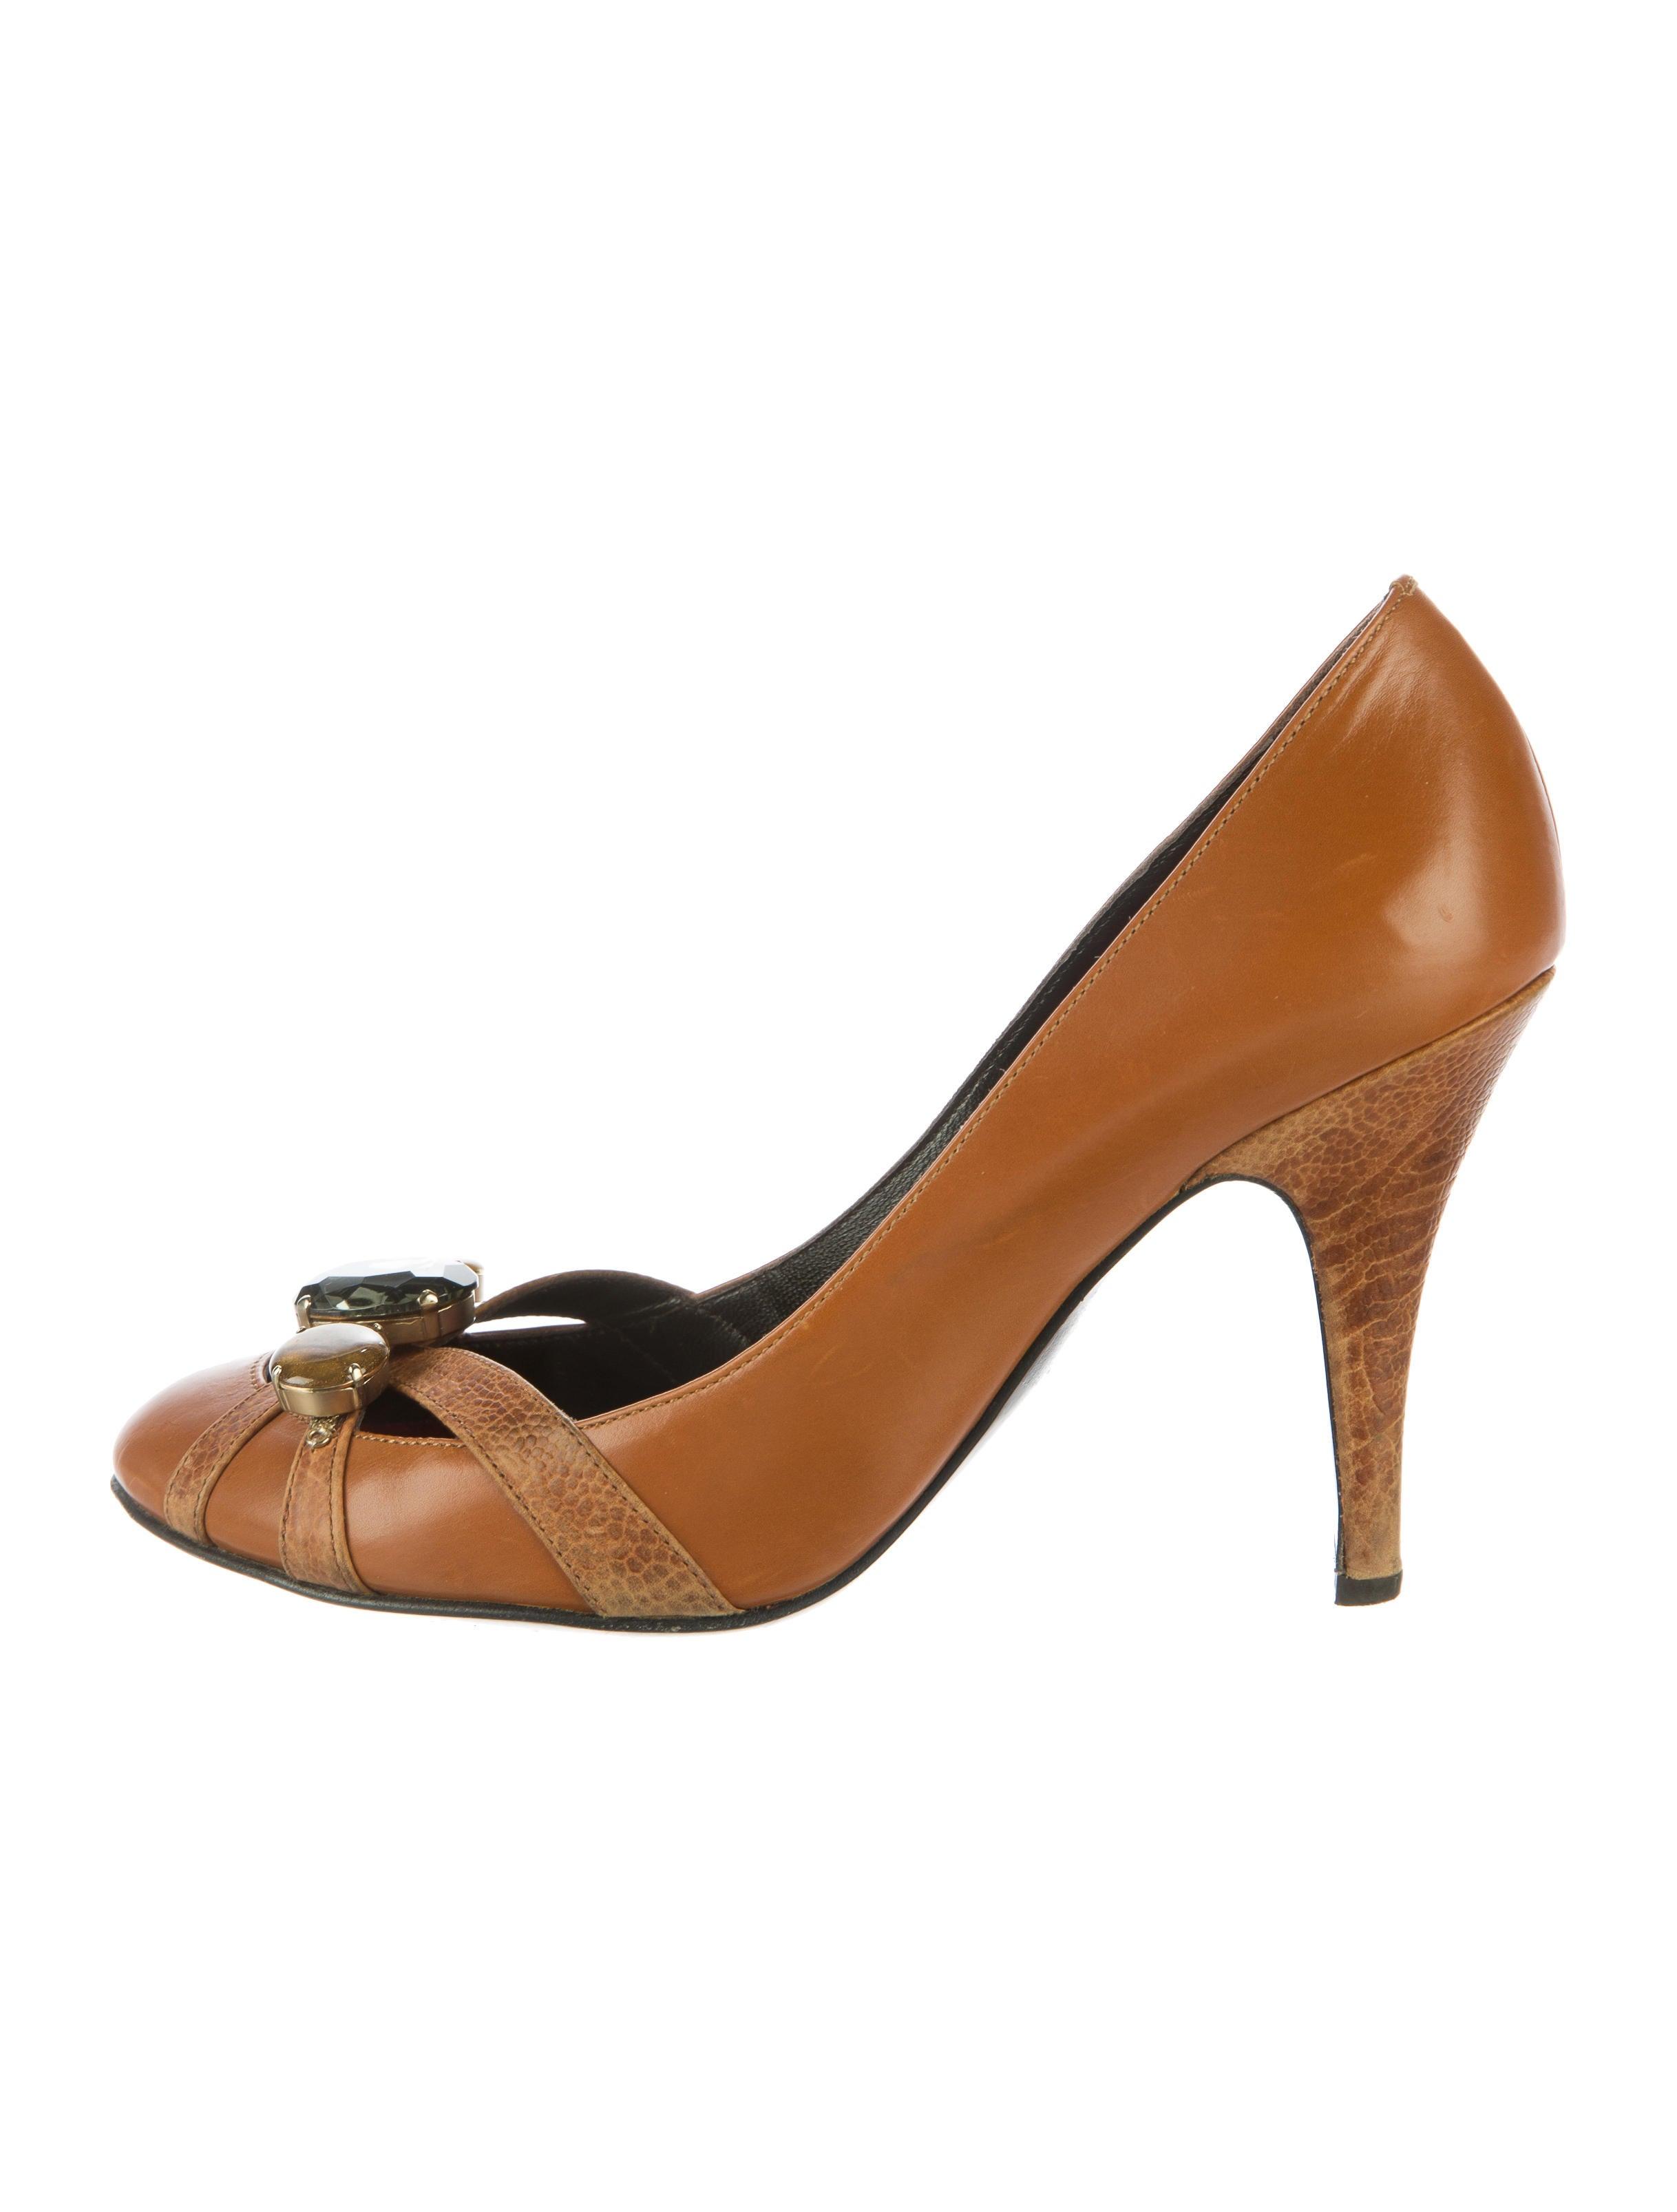 04f6ee1685 Zanotti Shoes For Sale Dubai High Ankle Shoe   Law Lanka